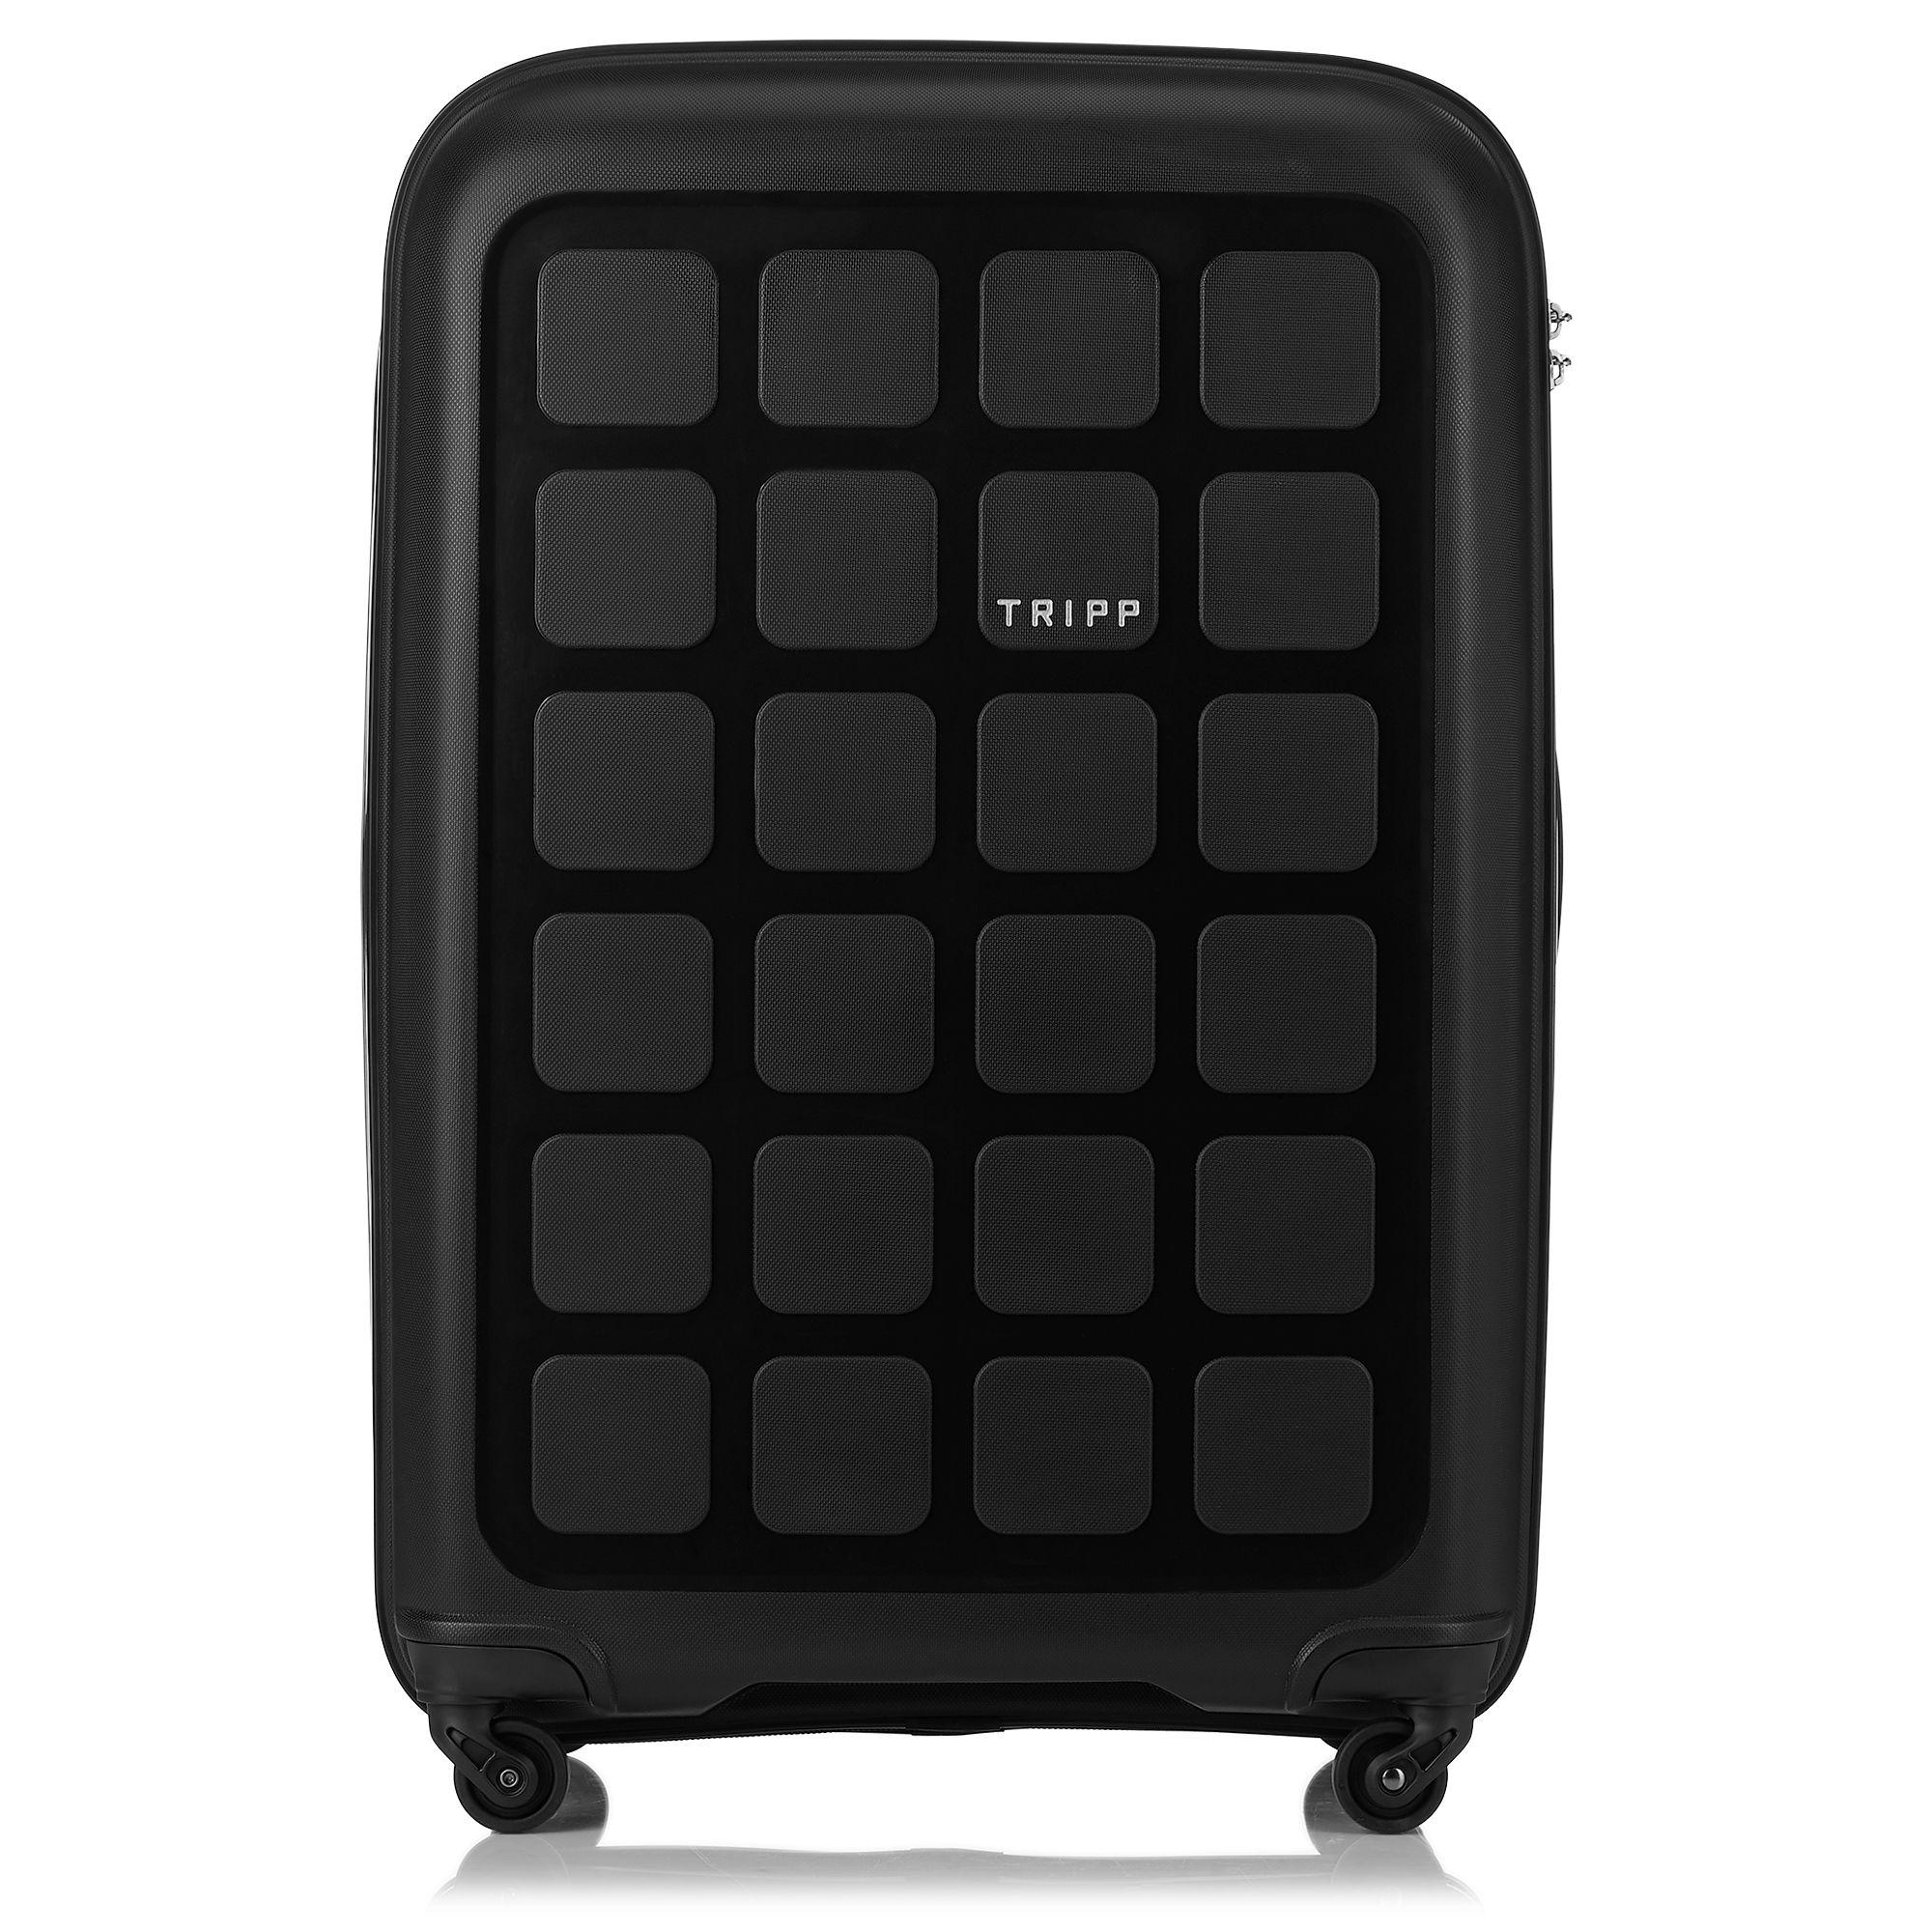 tripp black 39 holiday 6 39 large 4 wheel suitcase hard. Black Bedroom Furniture Sets. Home Design Ideas